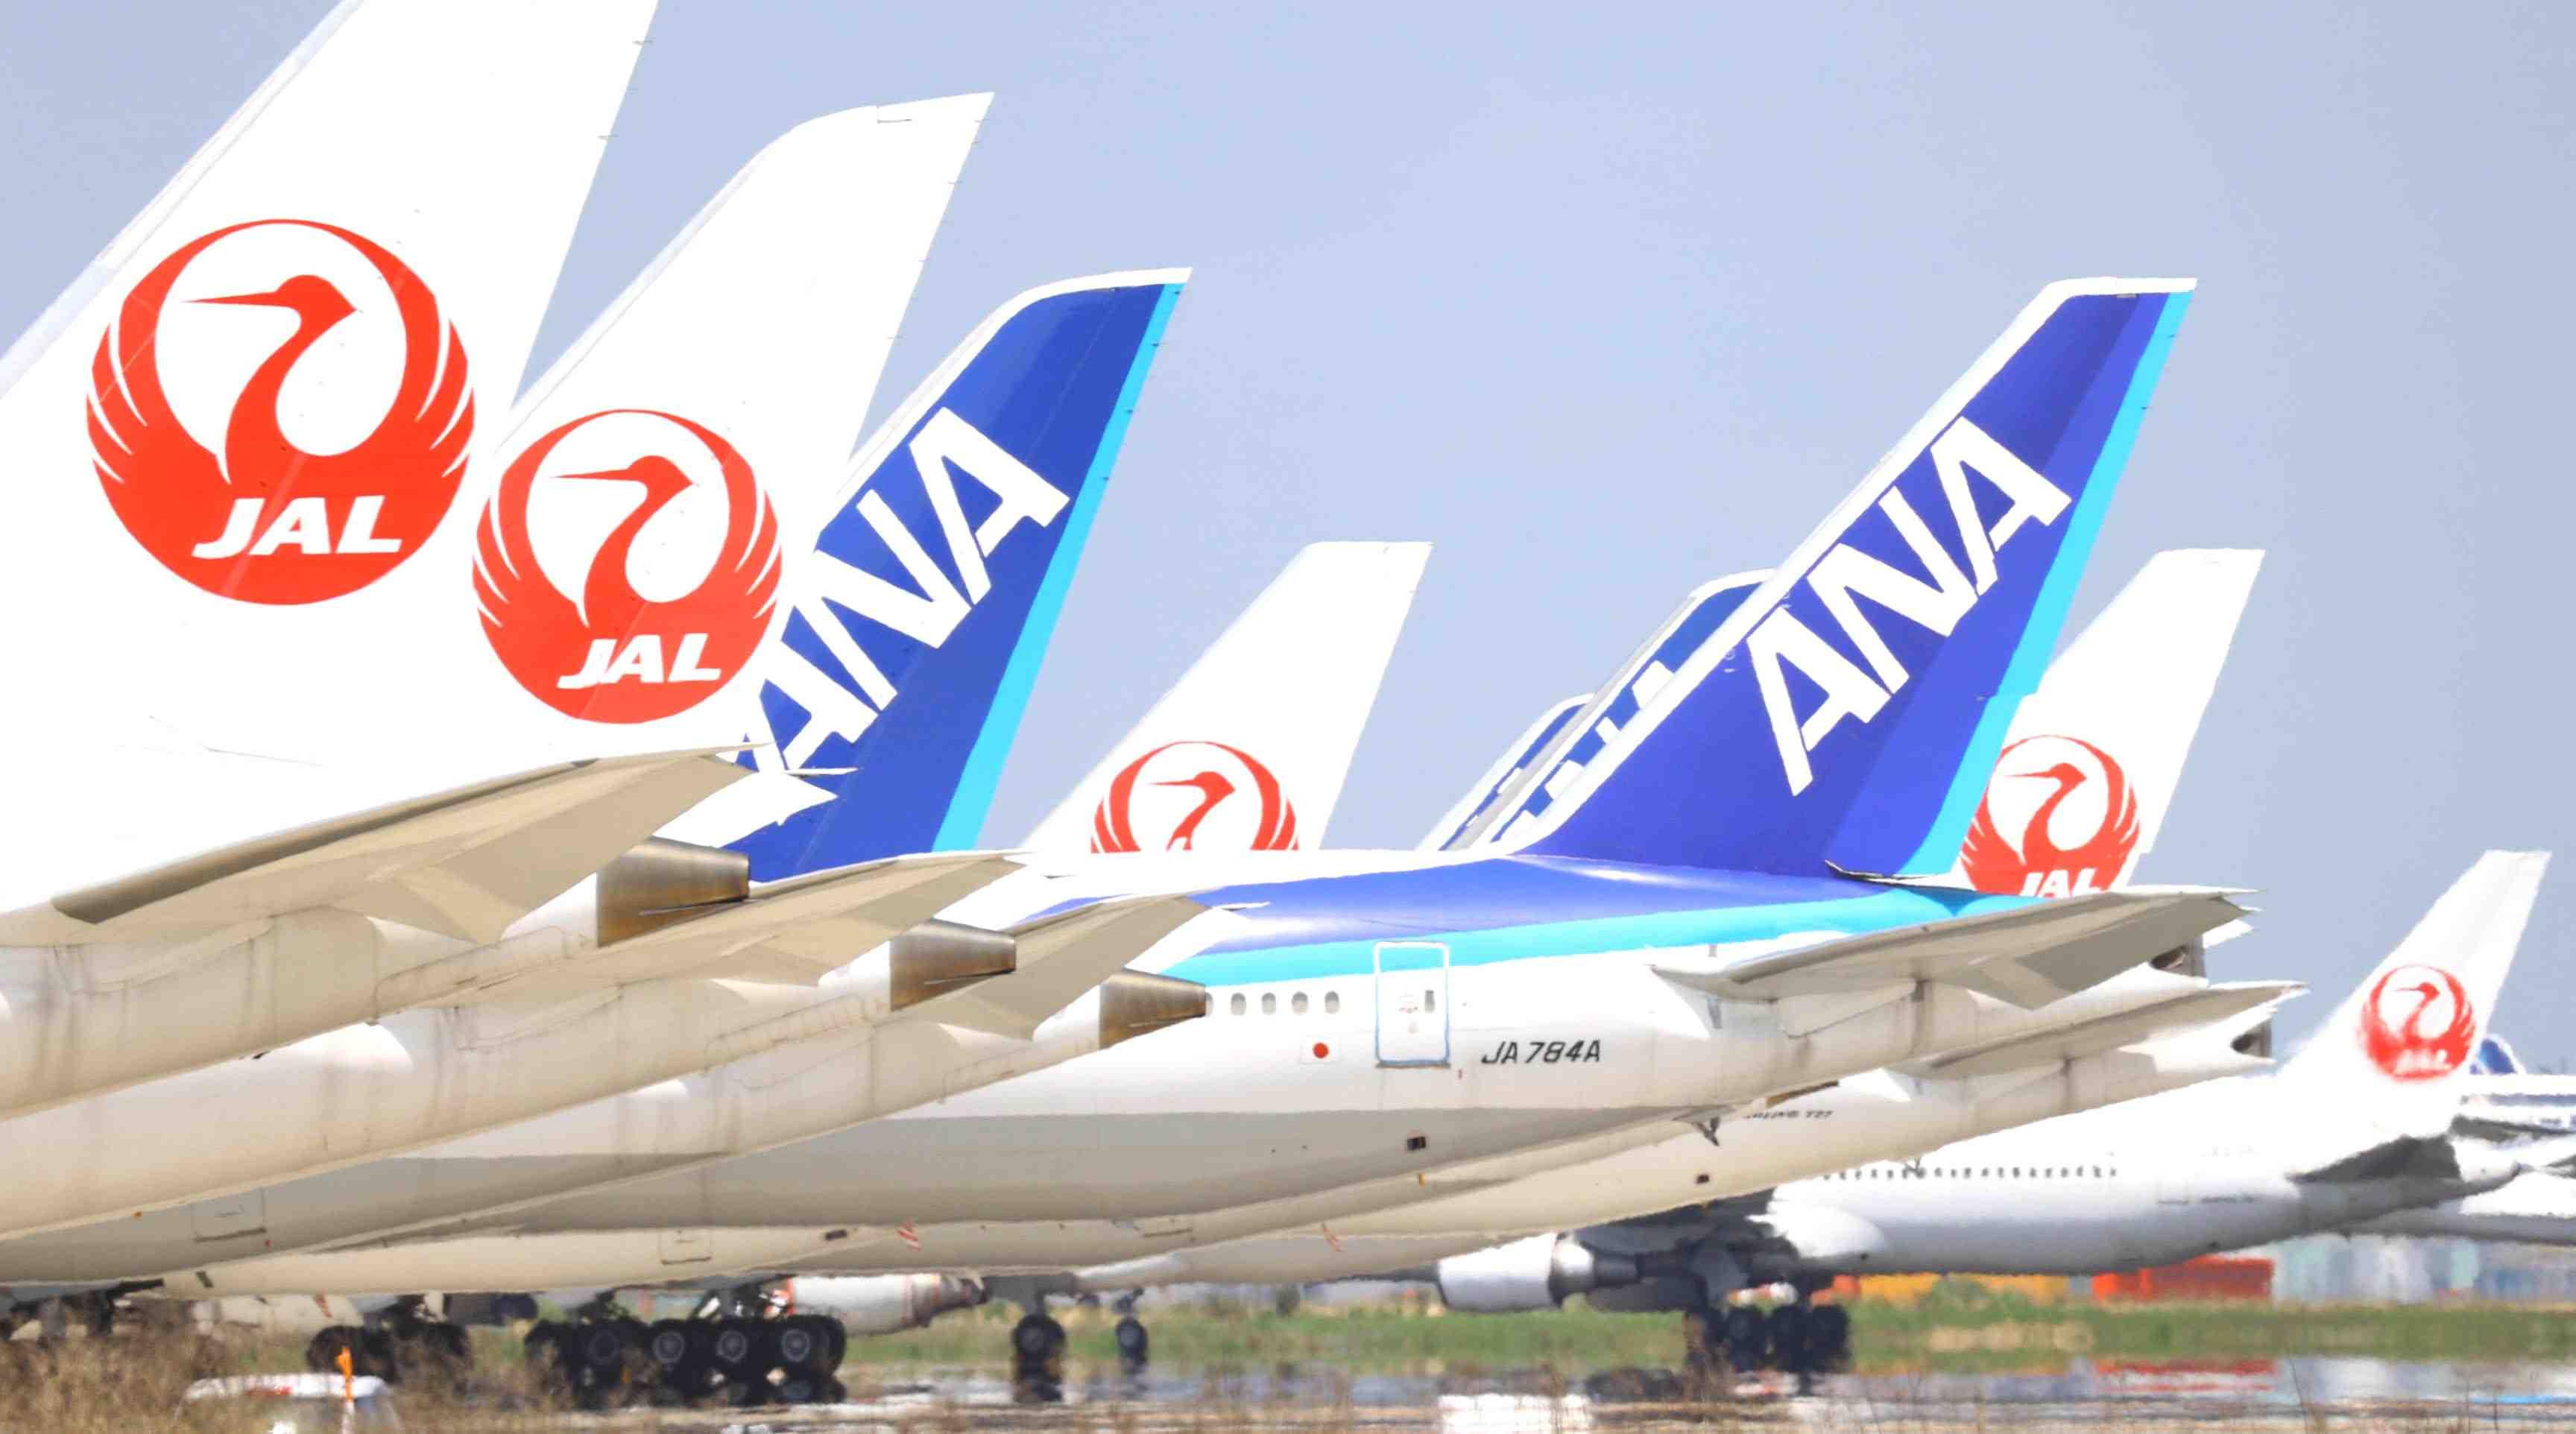 Tokyo Haneda airport JAL ANA 002